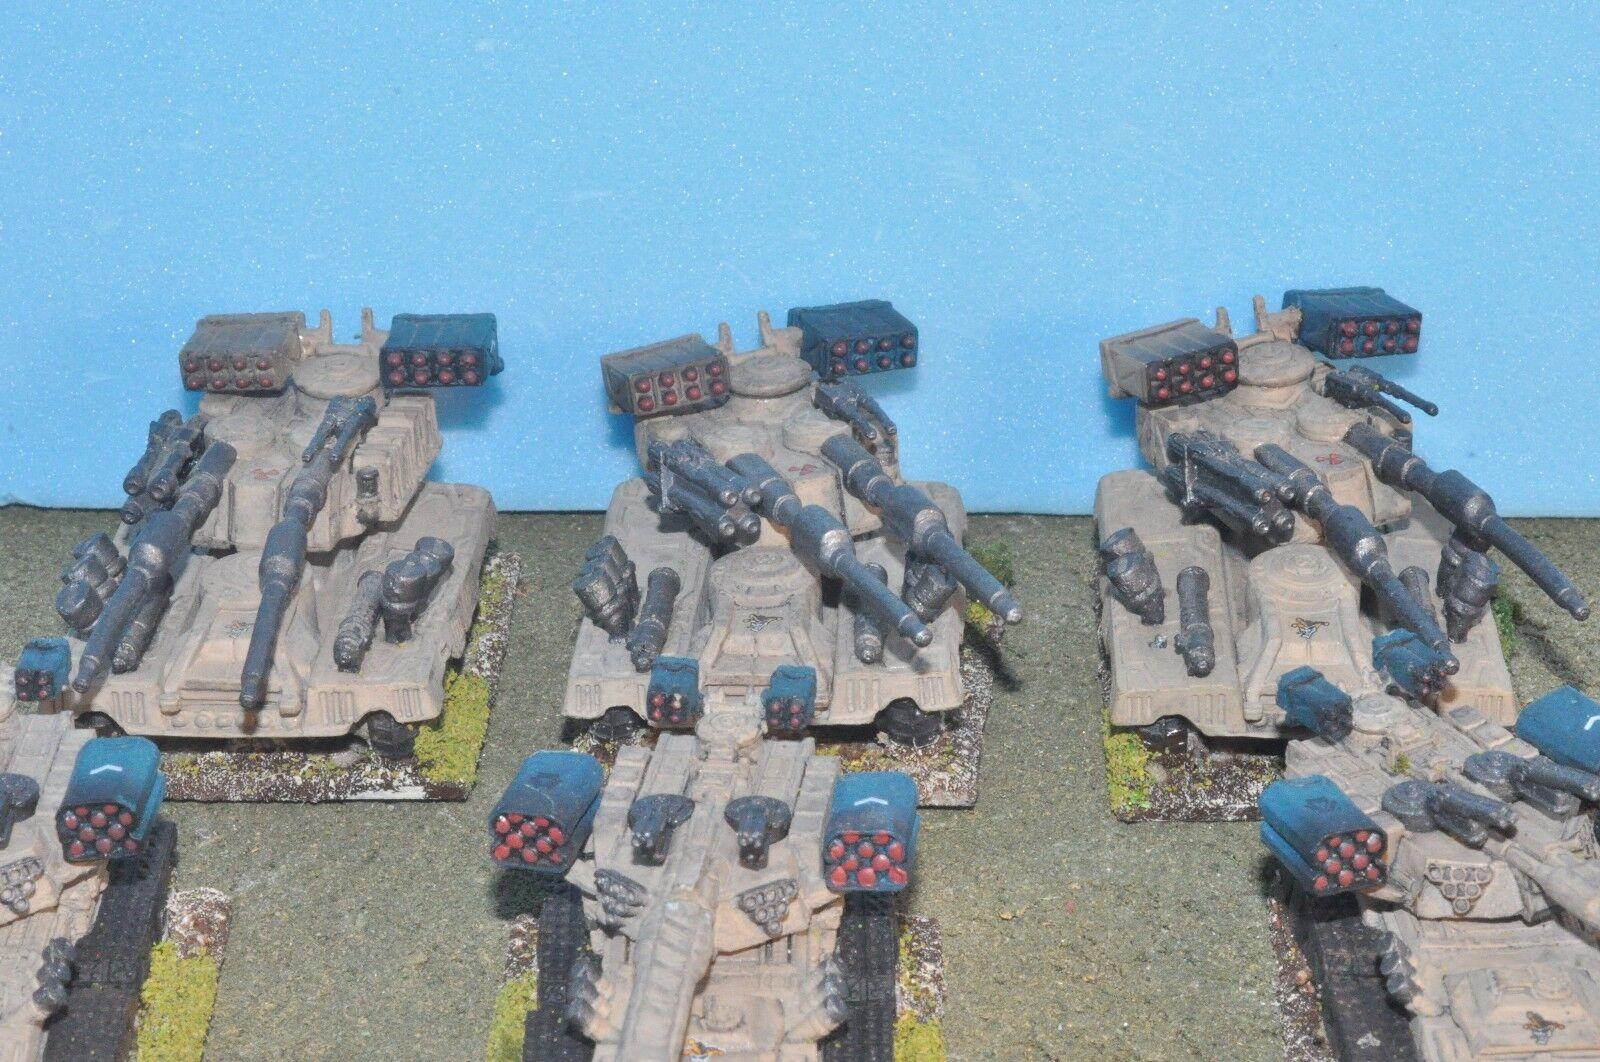 Mechwarrior battletech dropzone dropzone dropzone commander 6 heavy tanks (15084) FASA ral partha 56bbc7